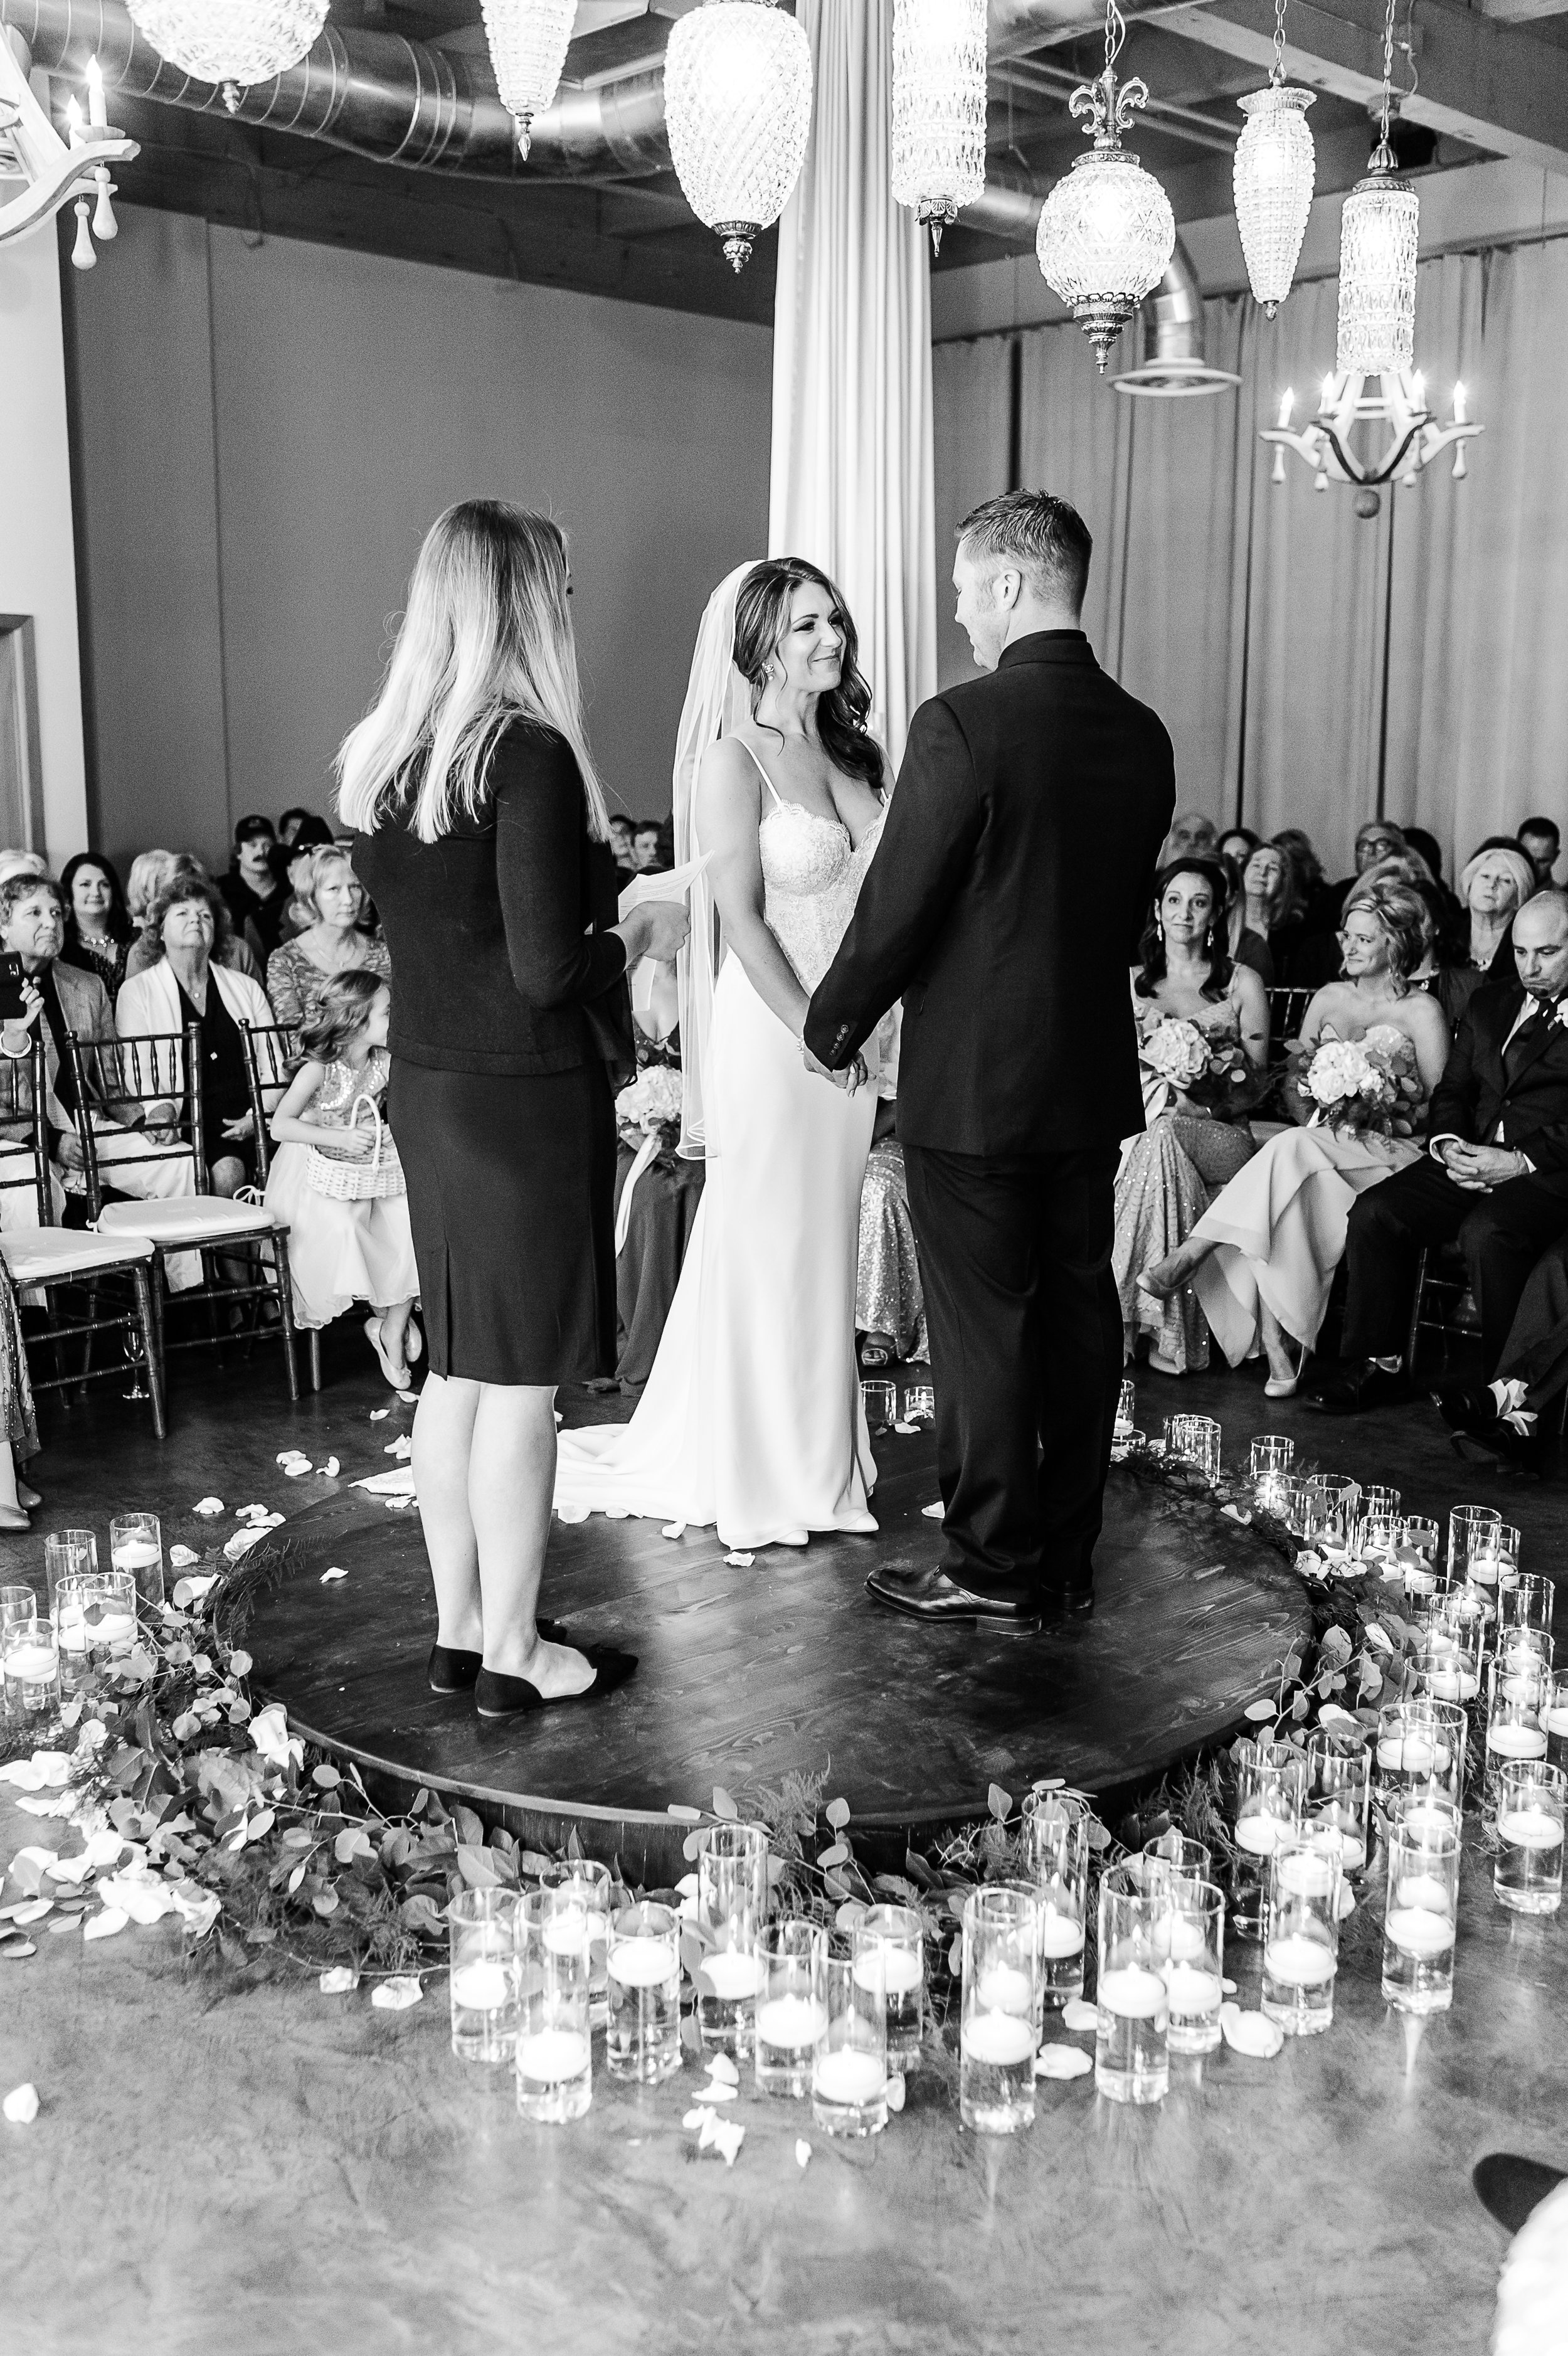 JJ-wedding-Van-Wyhe-Photography-373.jpg